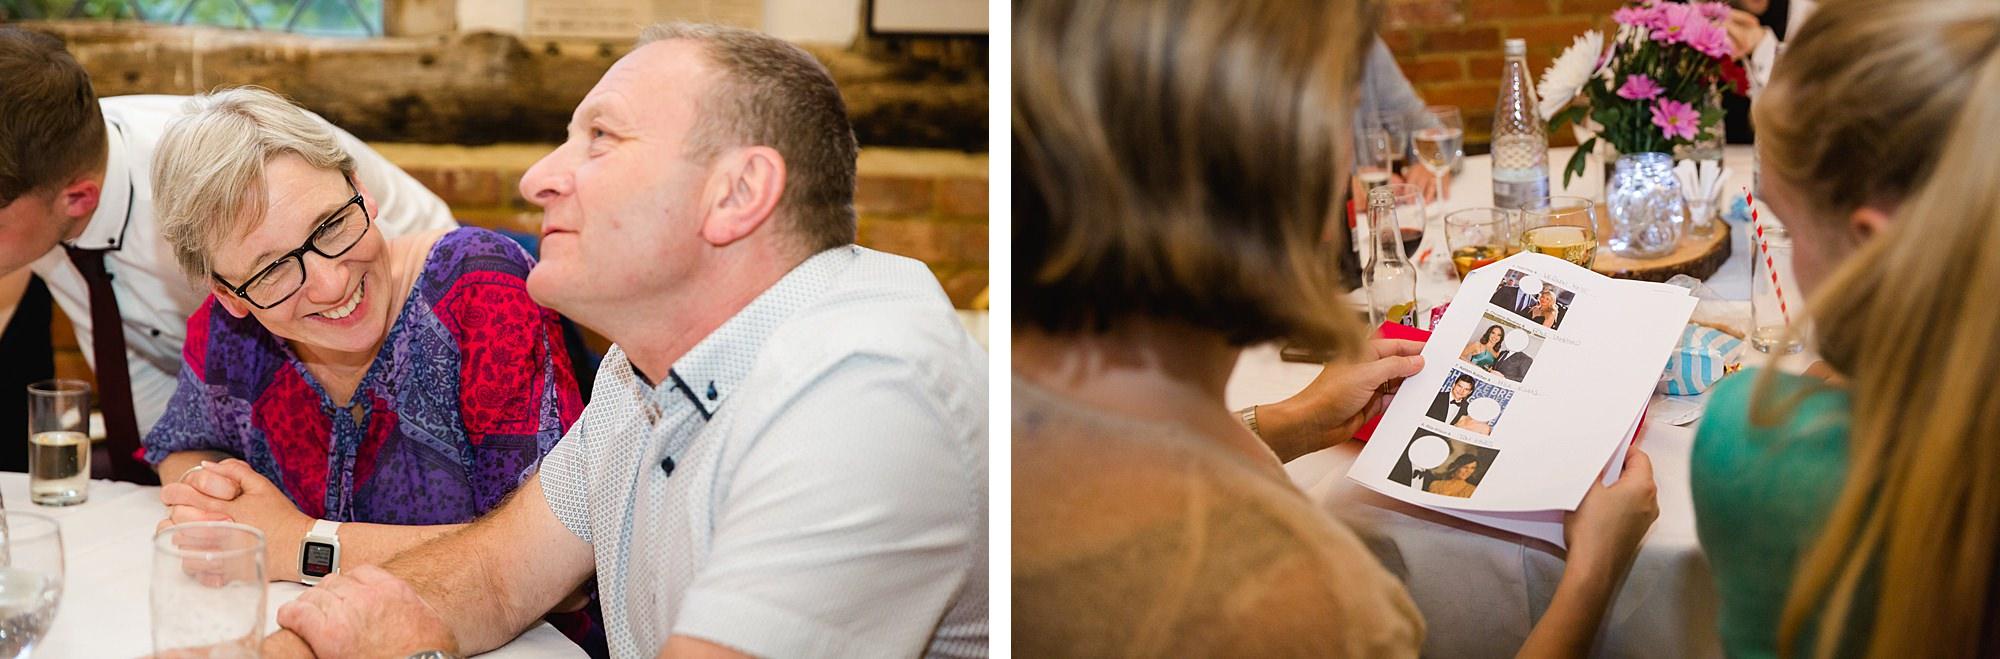 wedding guests considering quiz questions at norwood farm wedding